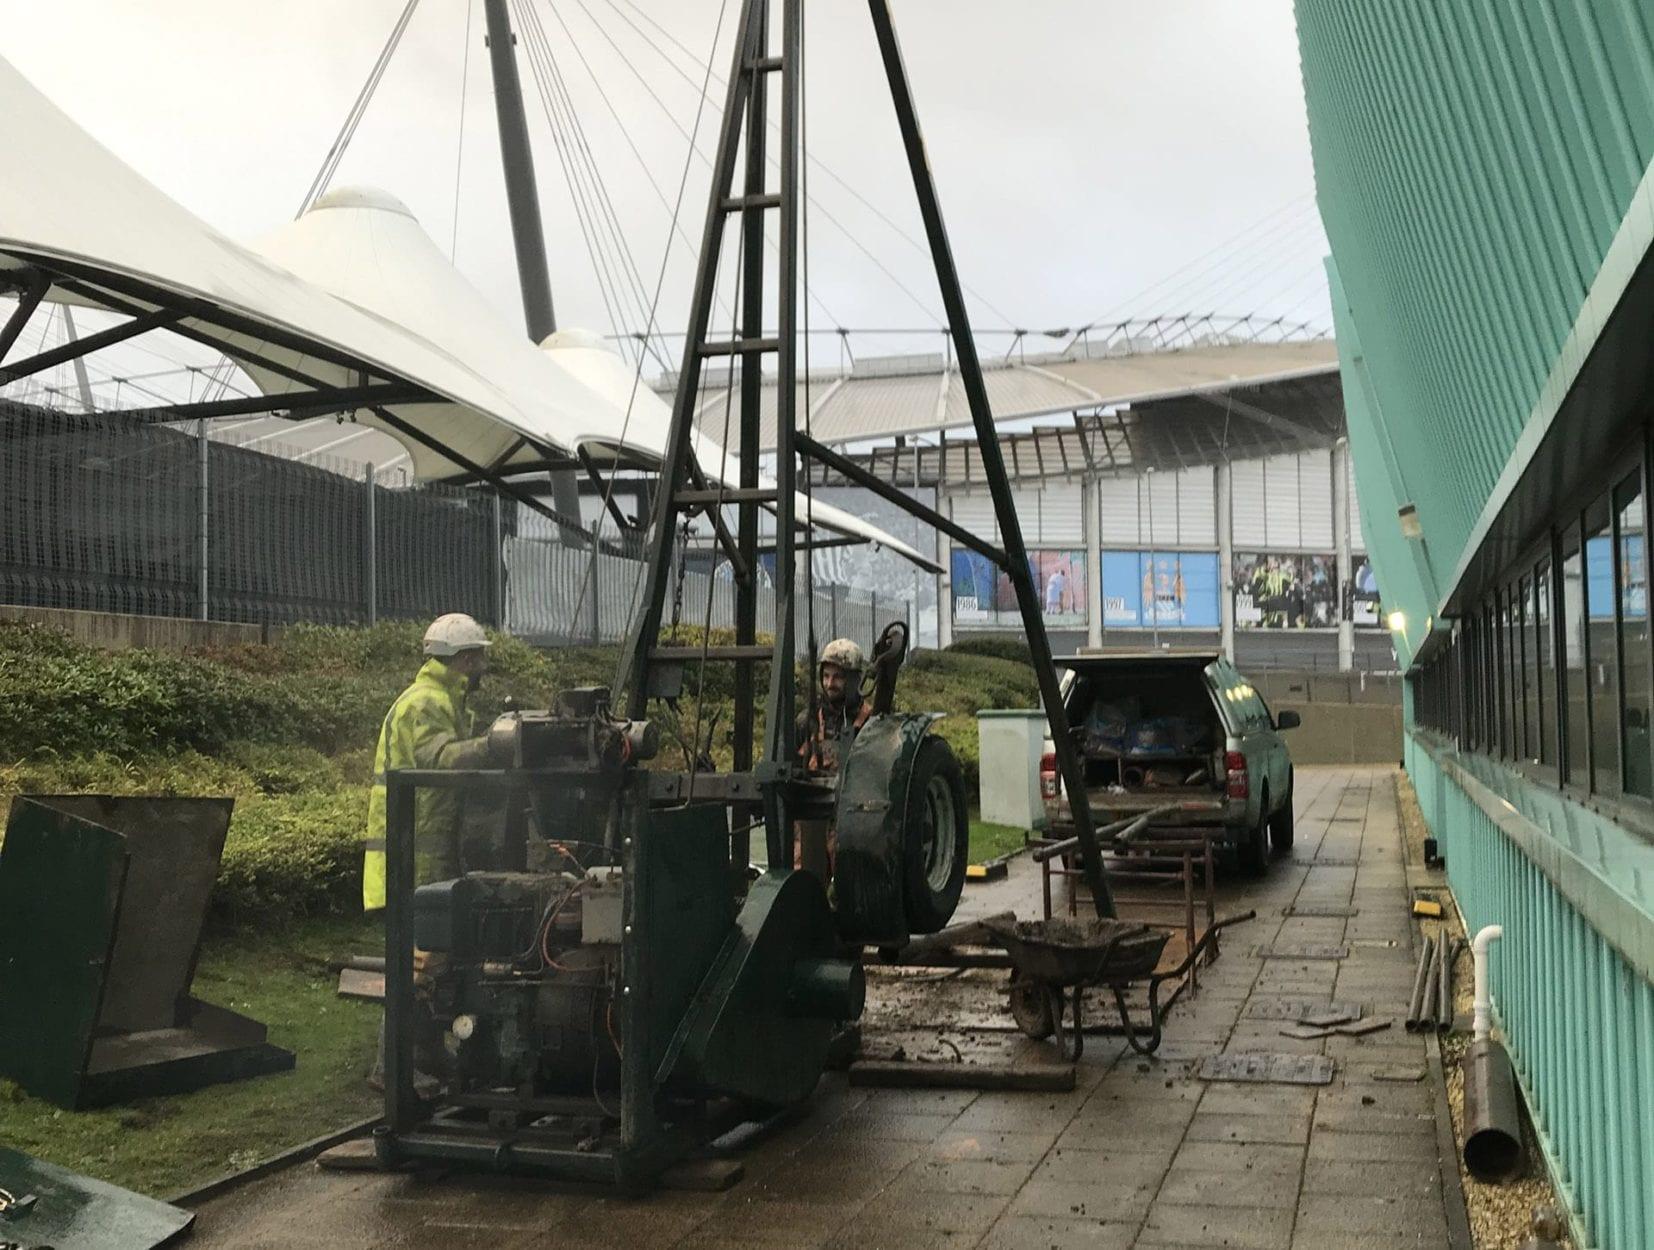 Geotechnical investigations at Manchester Etihad Stadium